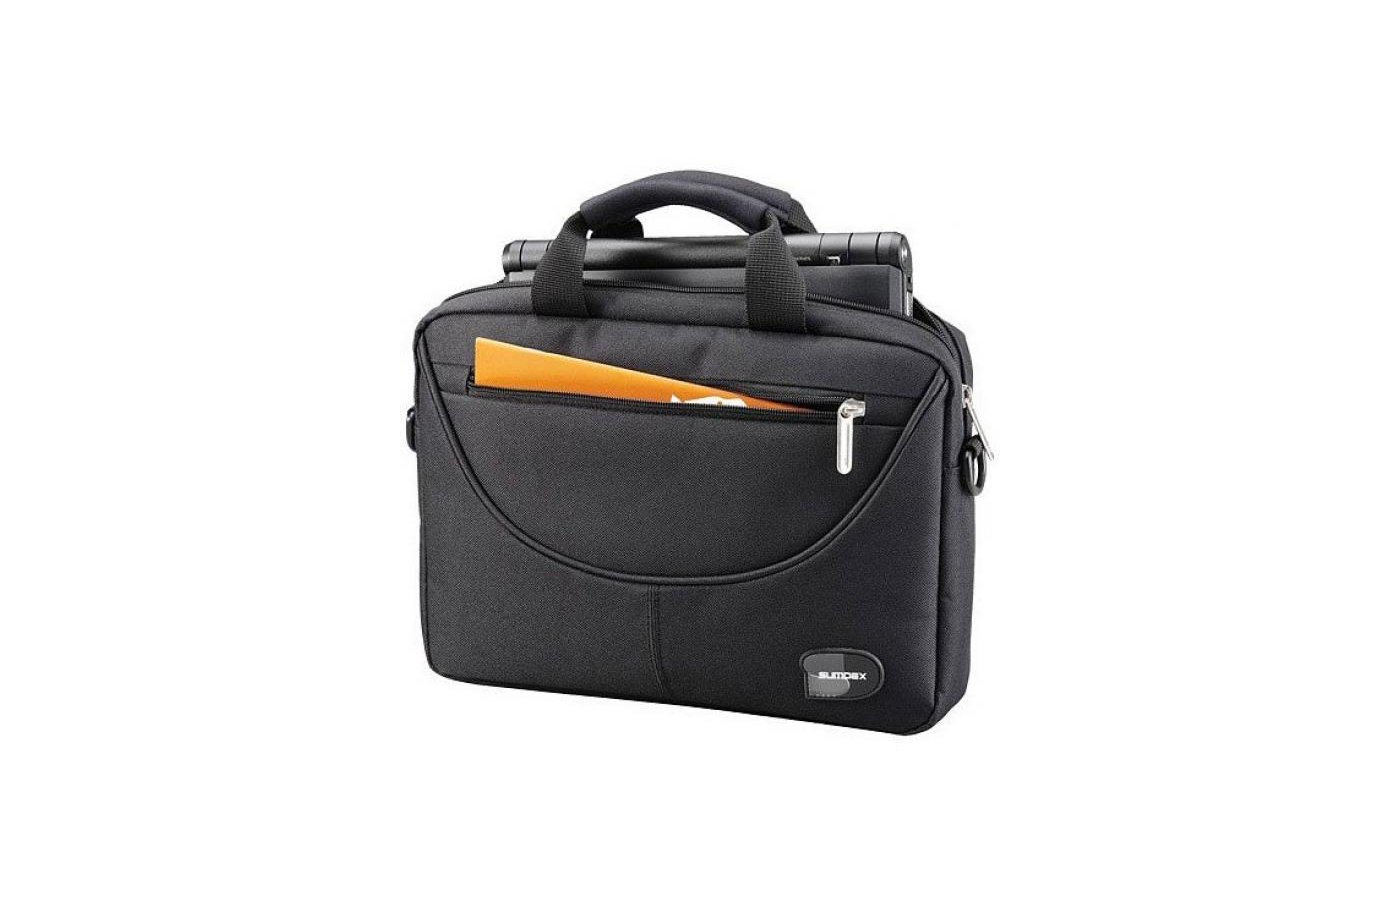 Кейс для ноутбука Sumdex PON-308BU Netbook Case до 10 (нейлон/полиэстер, голубой, 29,8 х 21 х 5,1 см.)